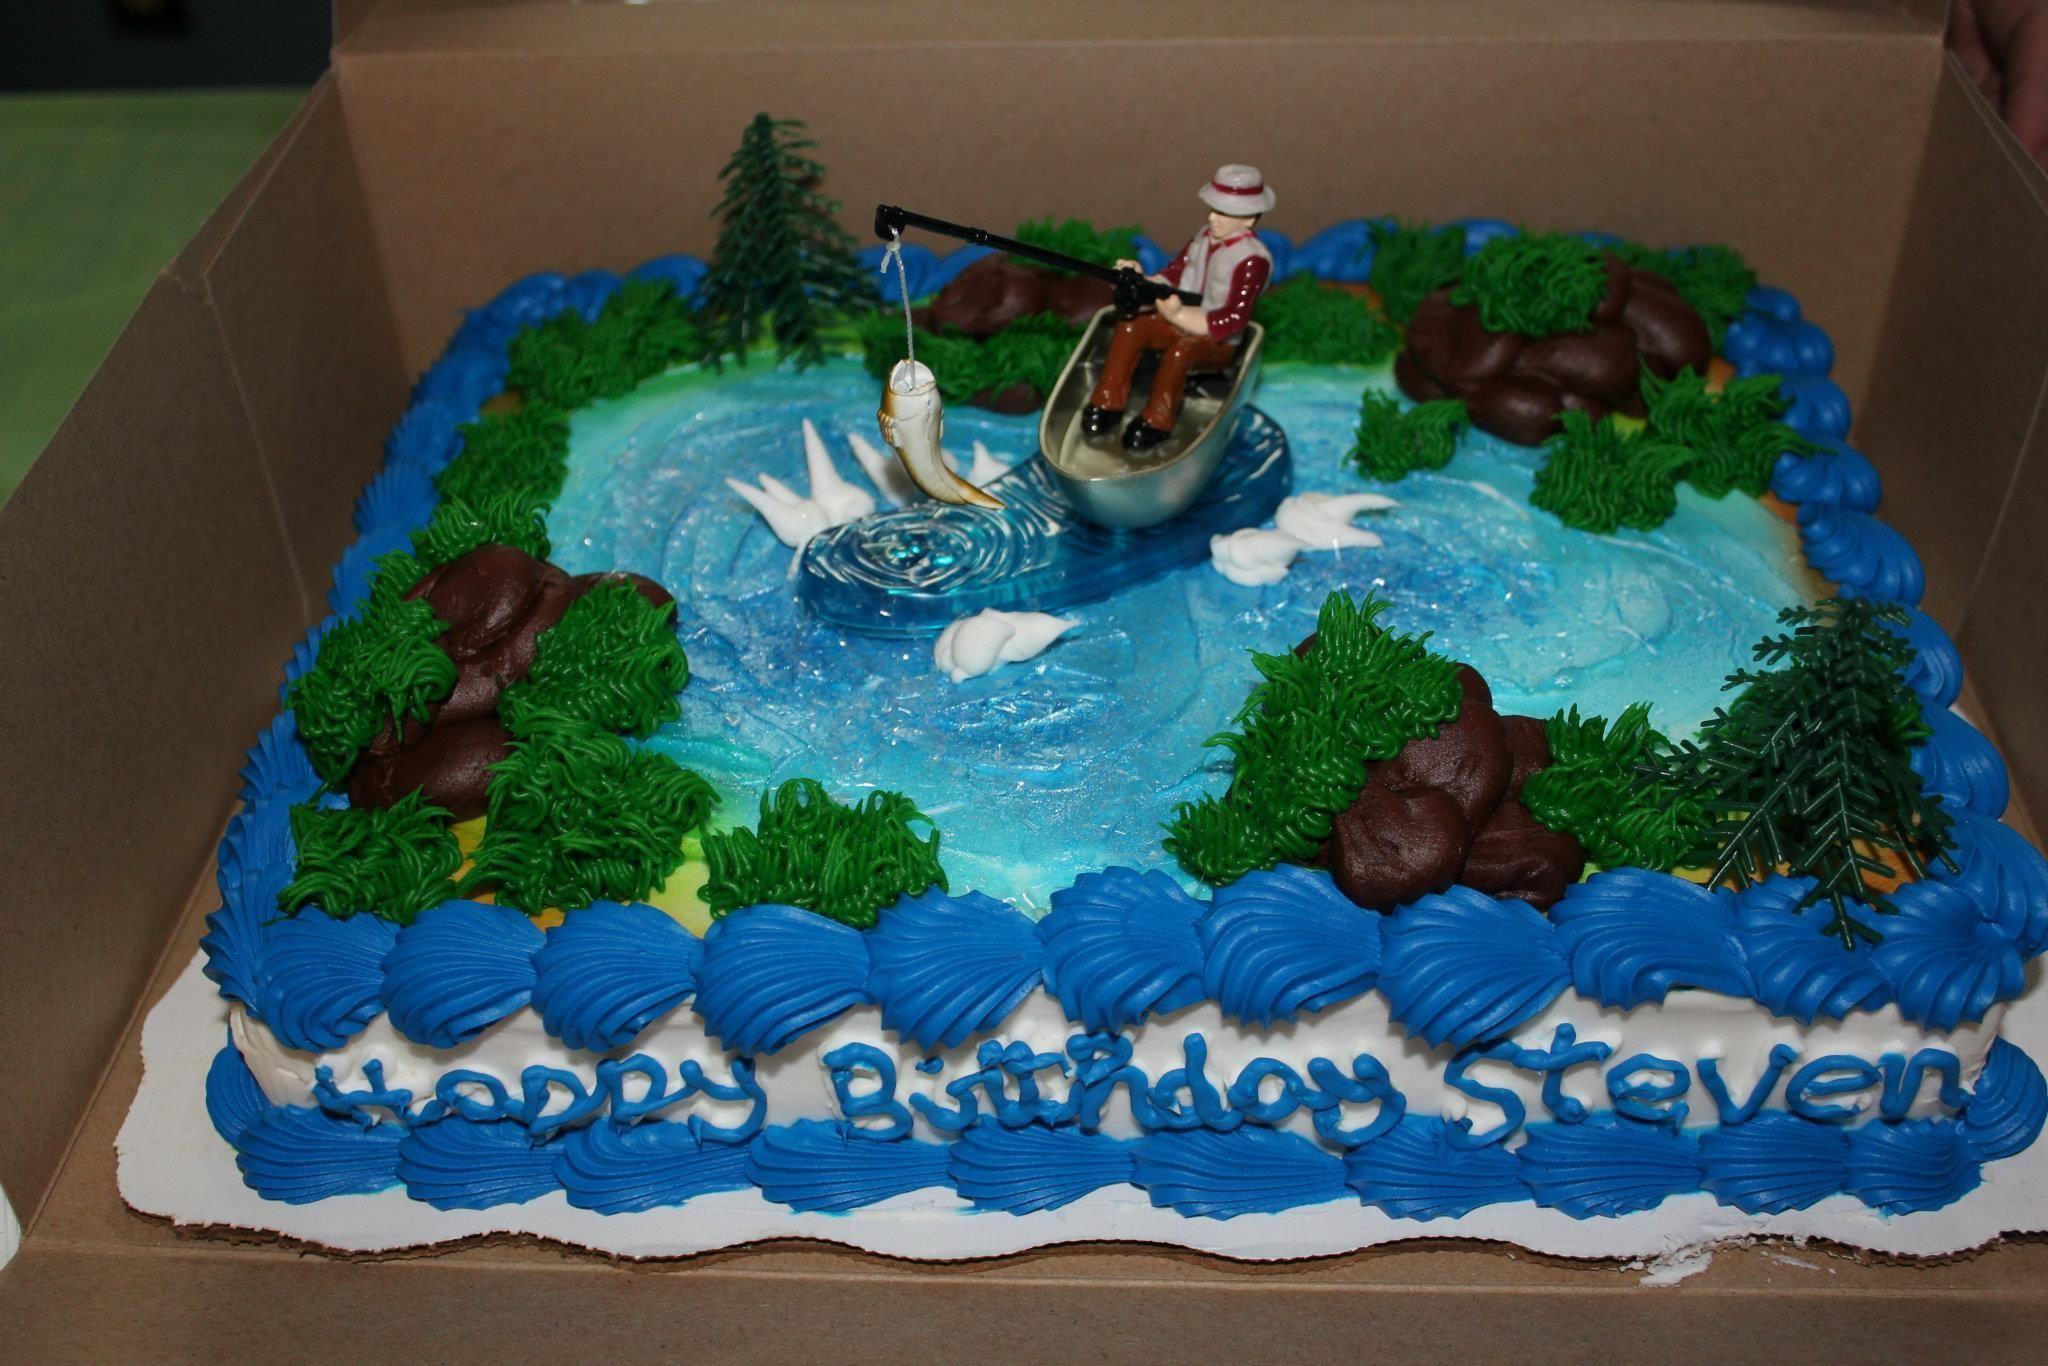 Remarkable Craftylillybargainbin Blogspot Com Walmart Bakery Birthday Funny Birthday Cards Online Elaedamsfinfo